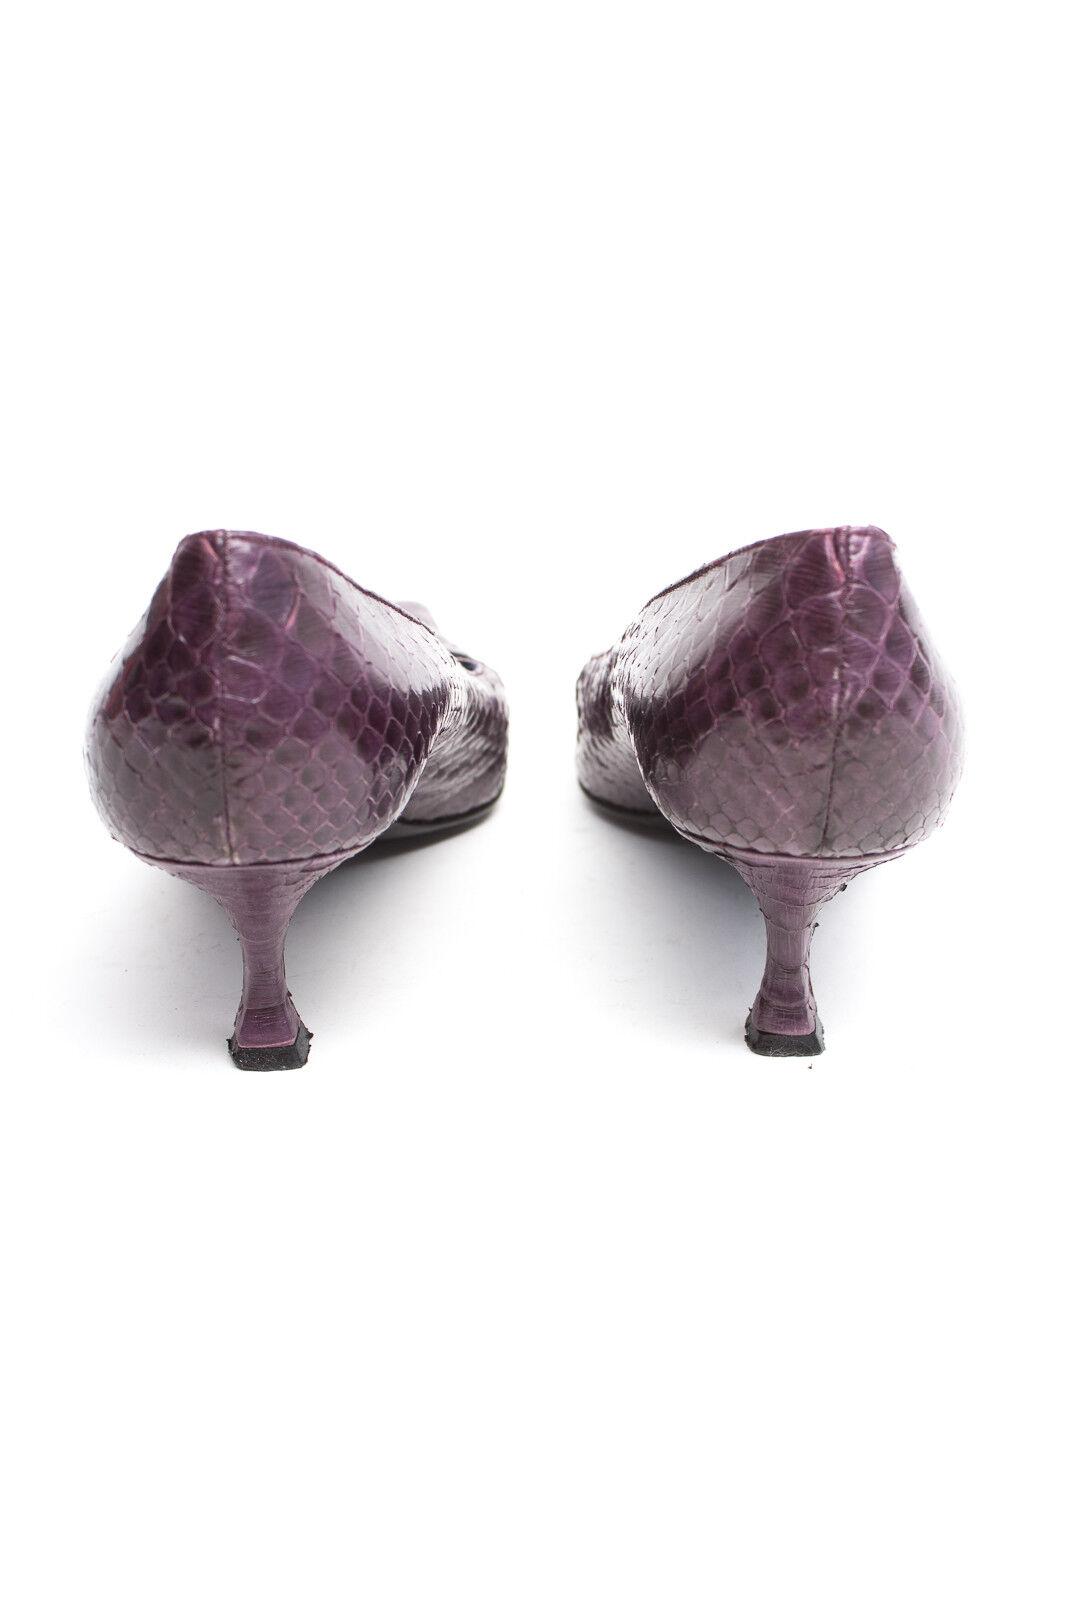 CLAUDIO tg. MERAZZI scarpe donna décolleté tg. CLAUDIO 40 viola in pelle d26e08